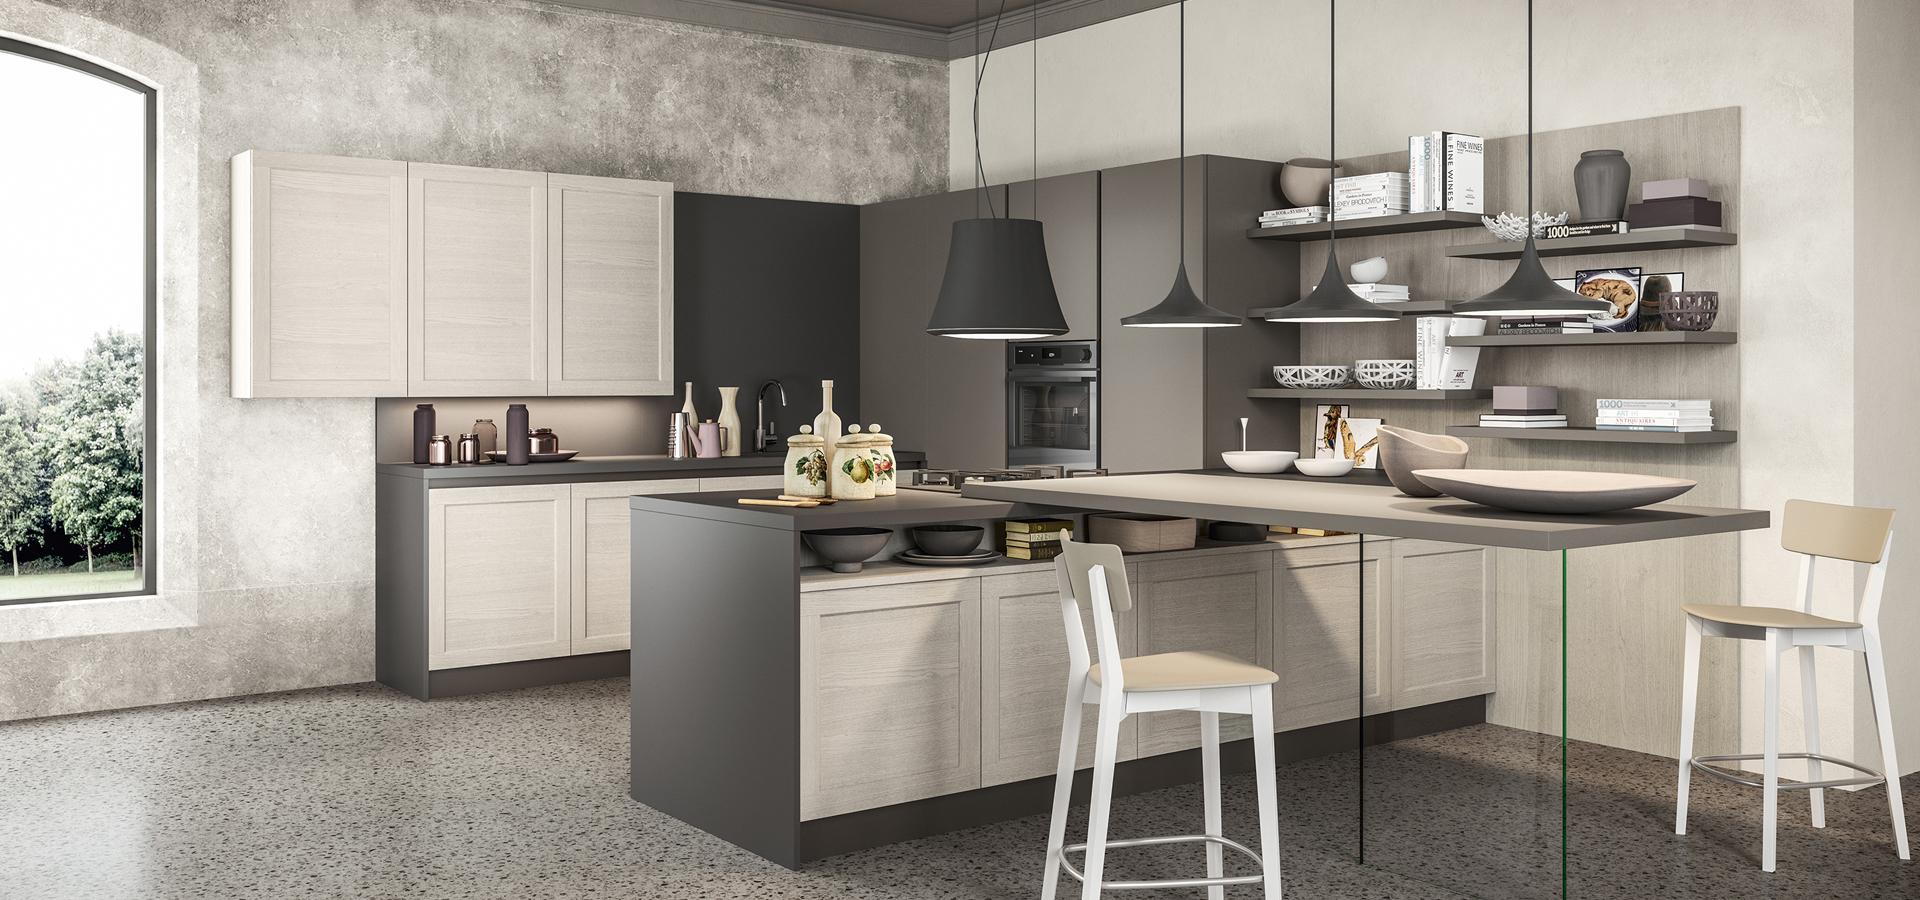 magasin de cuisines arras kubbe kubbe cuisine arras. Black Bedroom Furniture Sets. Home Design Ideas